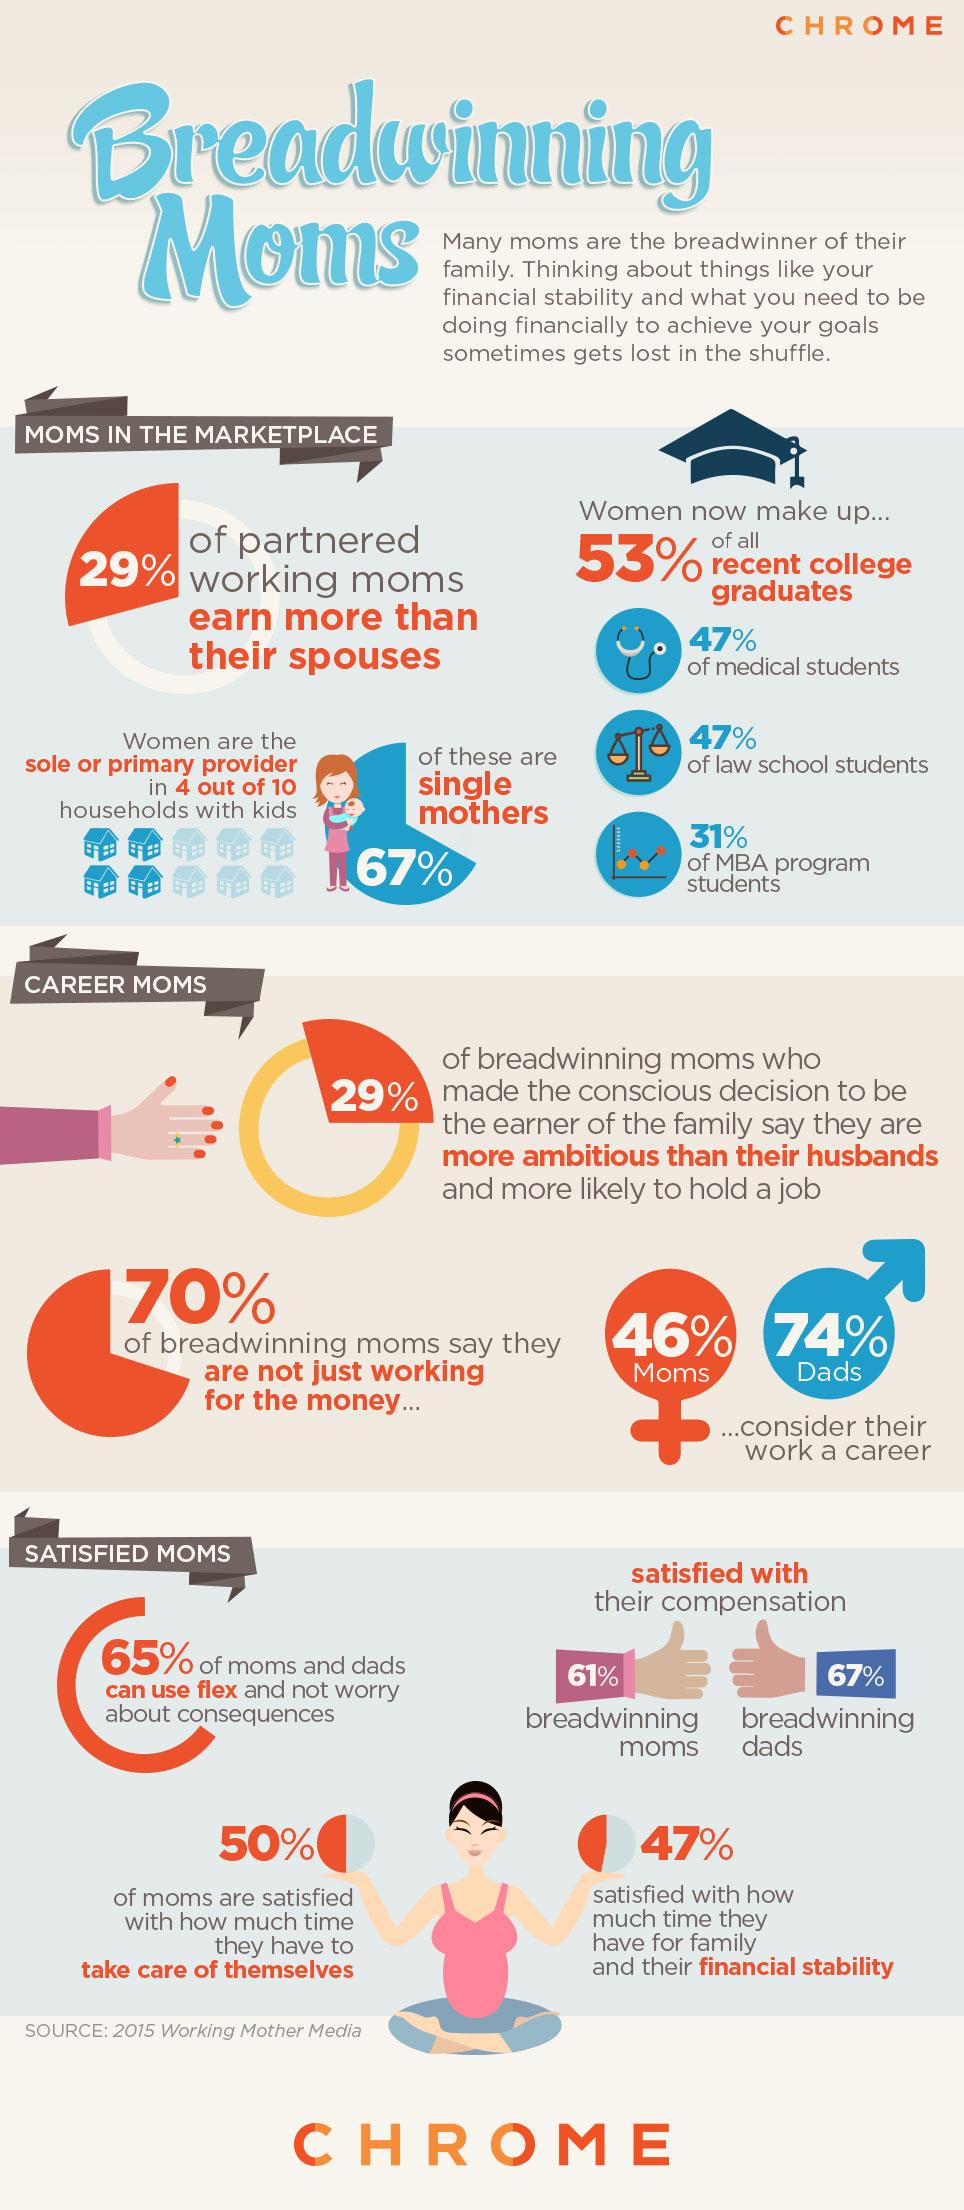 Breadwinner Moms Statistics